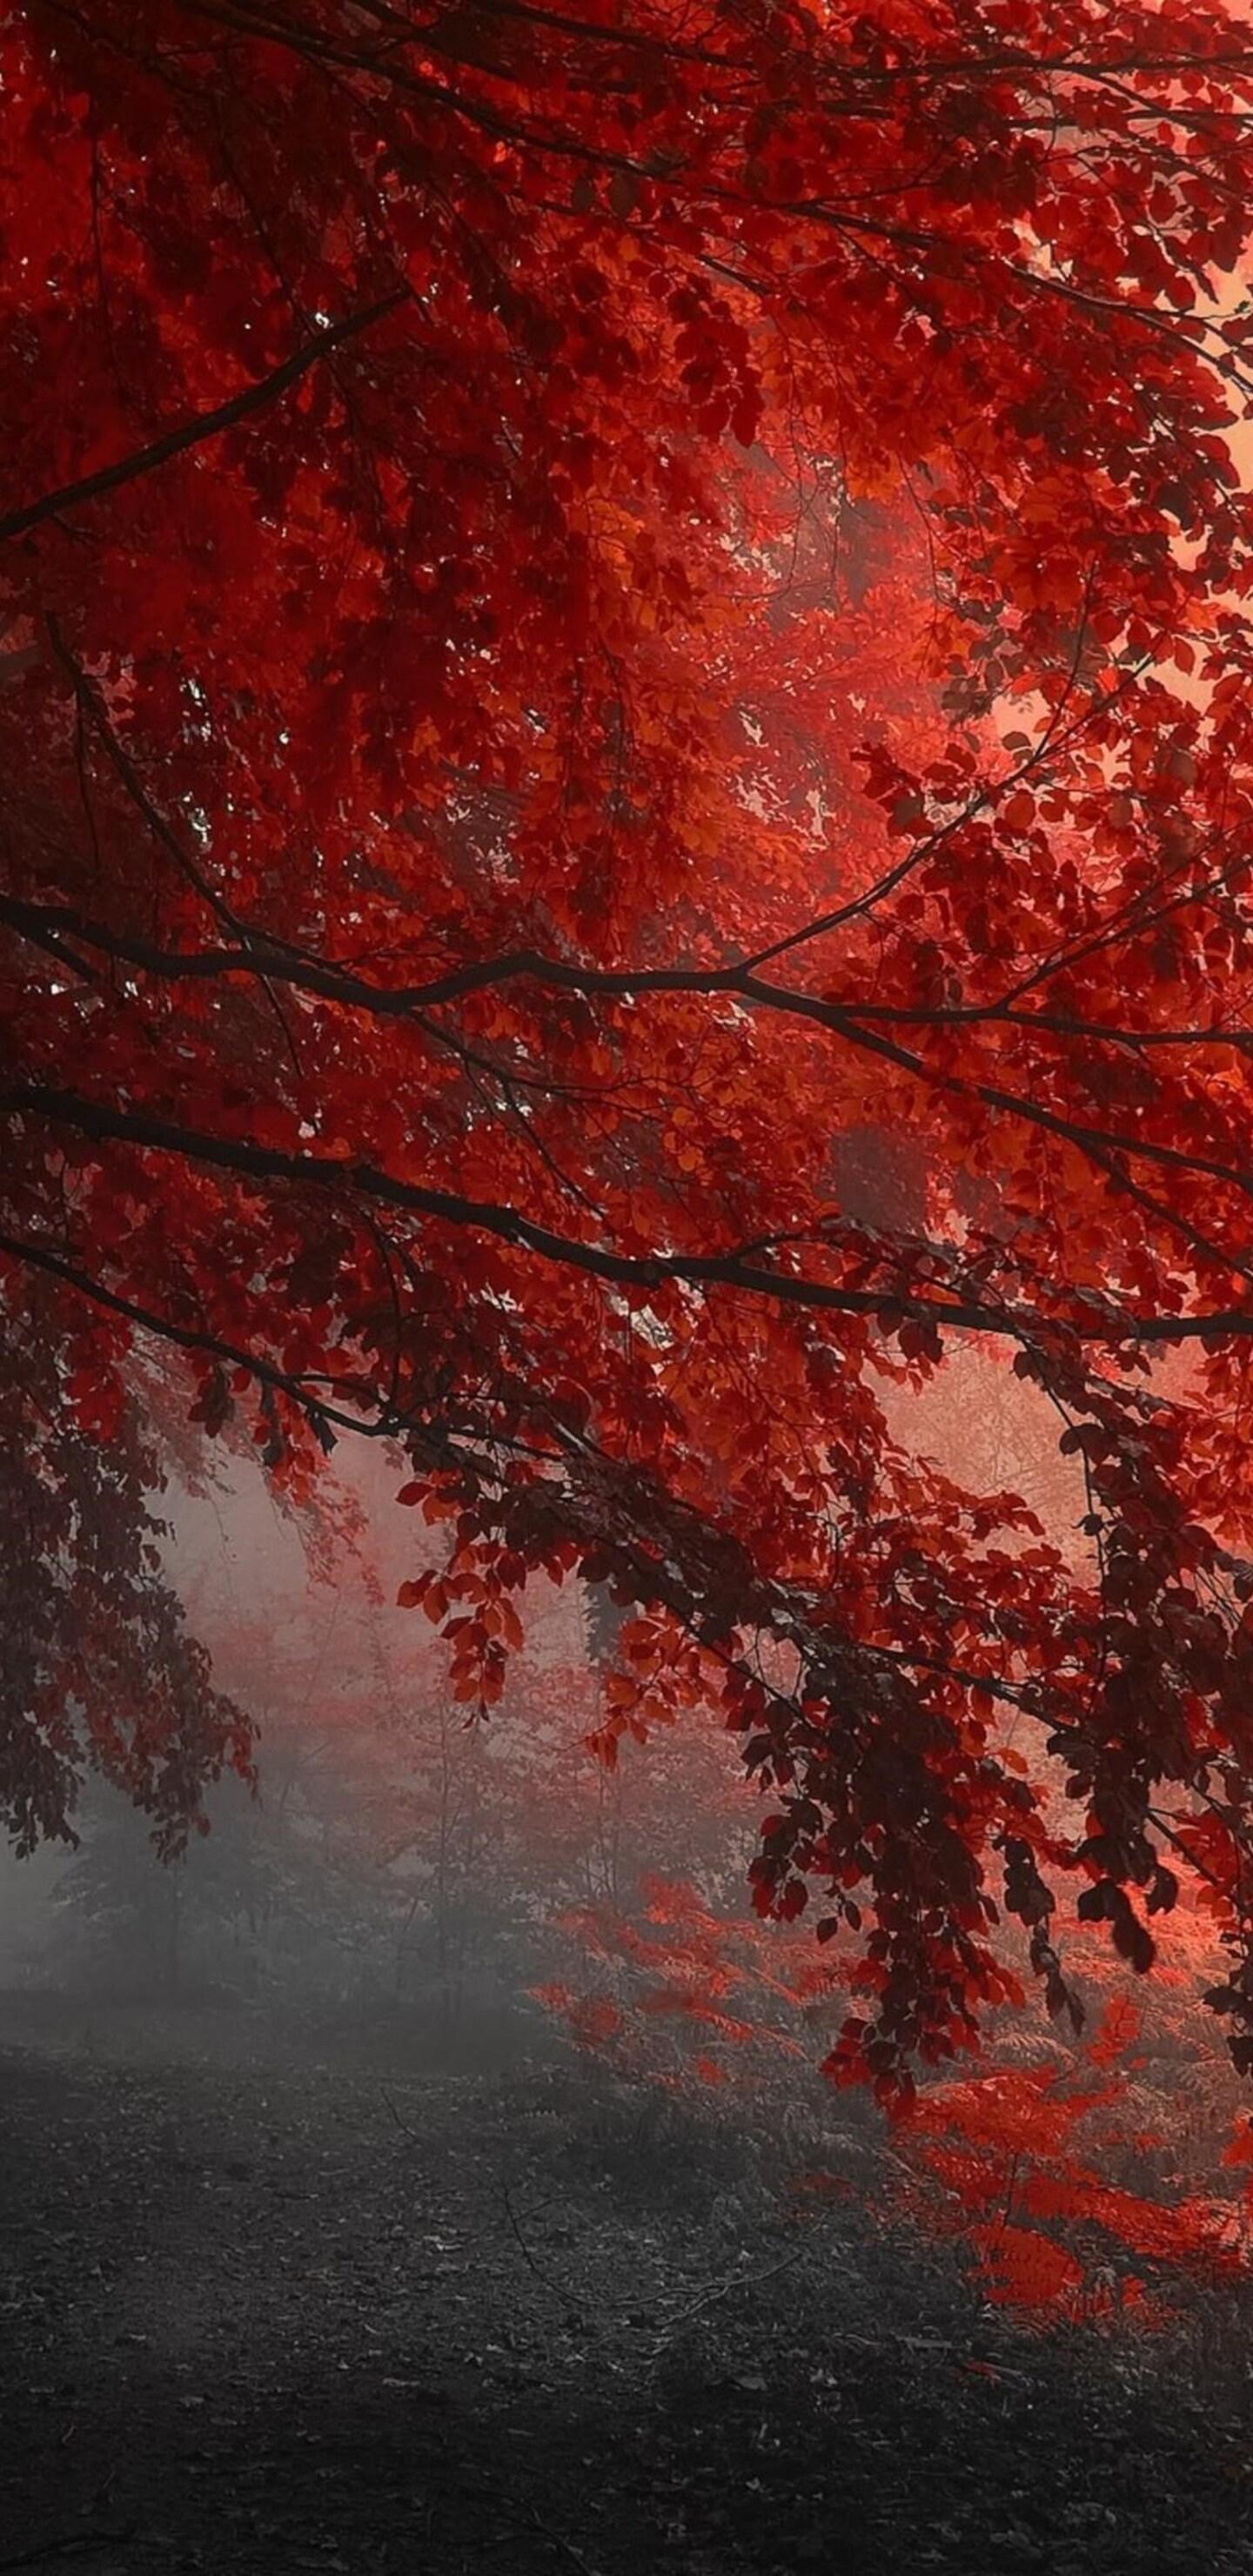 Autumn Tag wallpapers Page Lakes Trees Autumn Leaves Season Pond